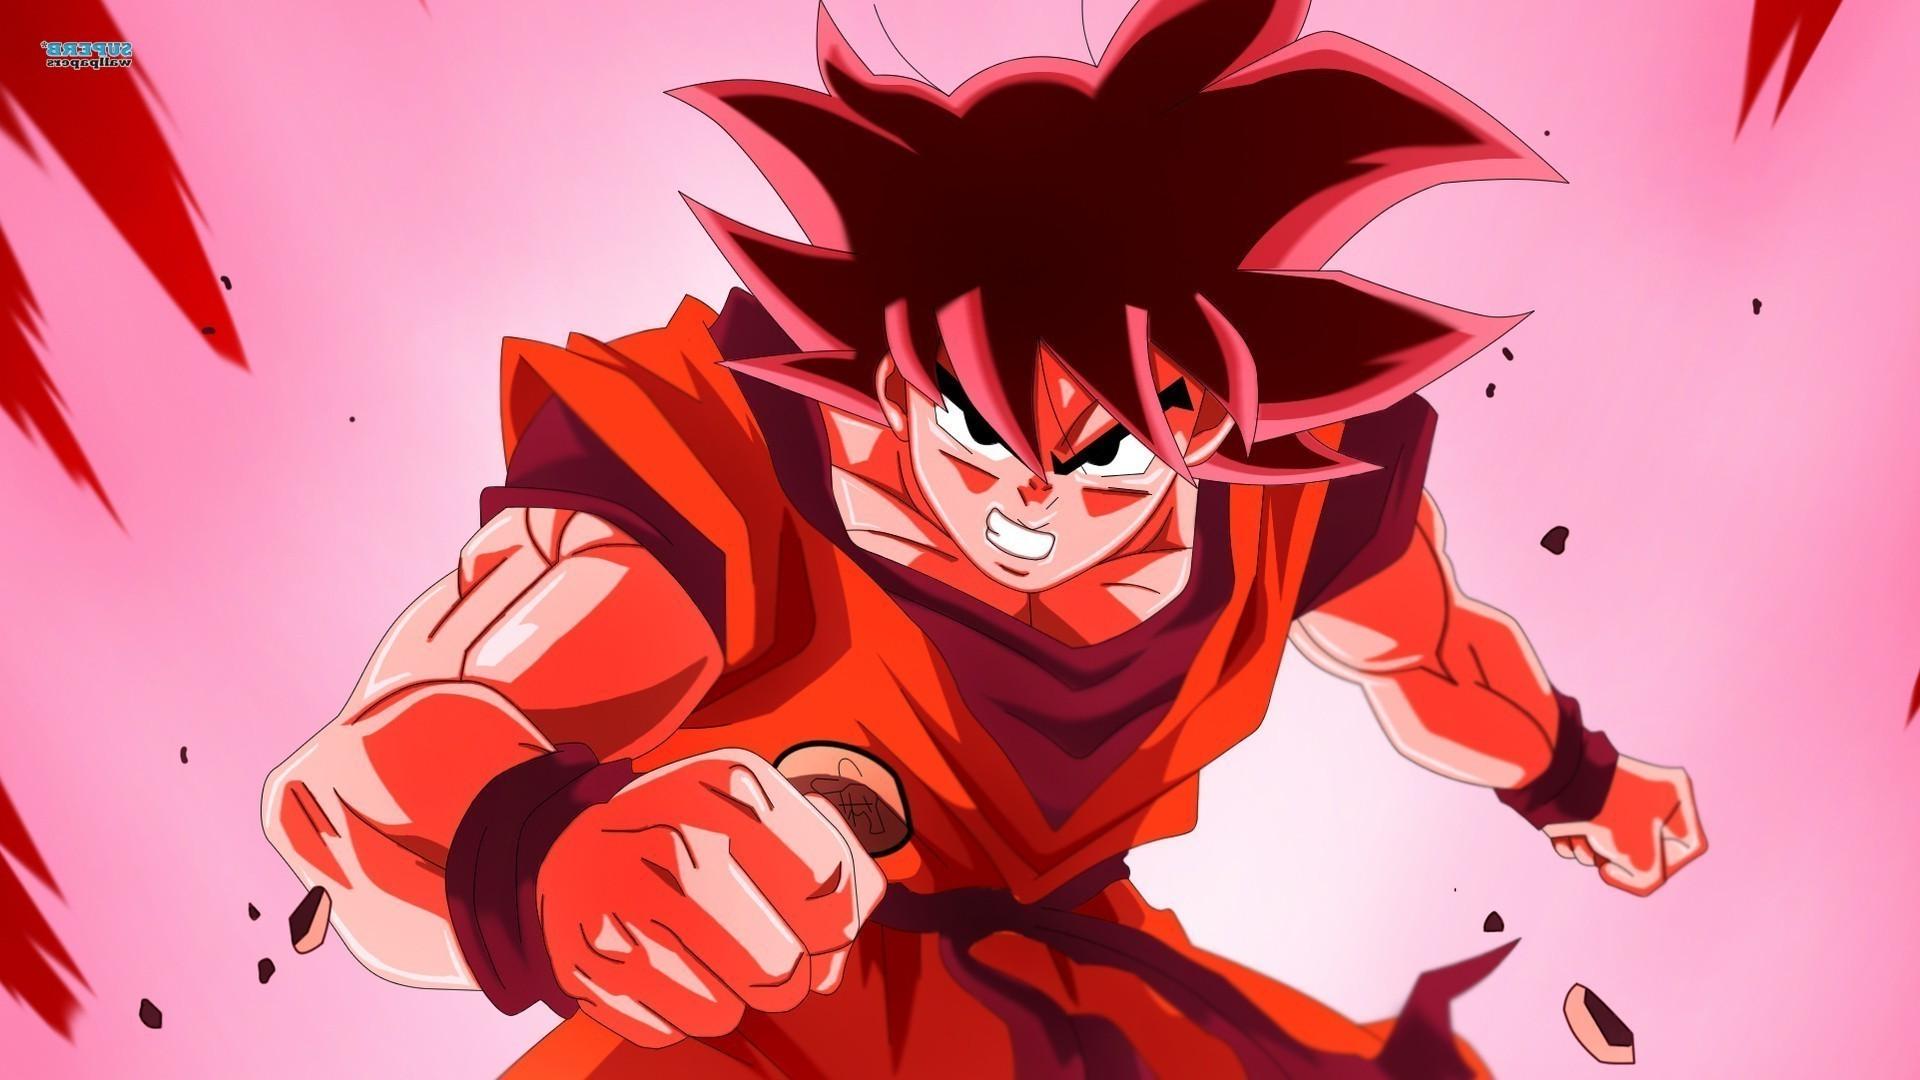 Dragon Ball Z Wallpaper Goku Super Saiyan God Wengerluggagesave